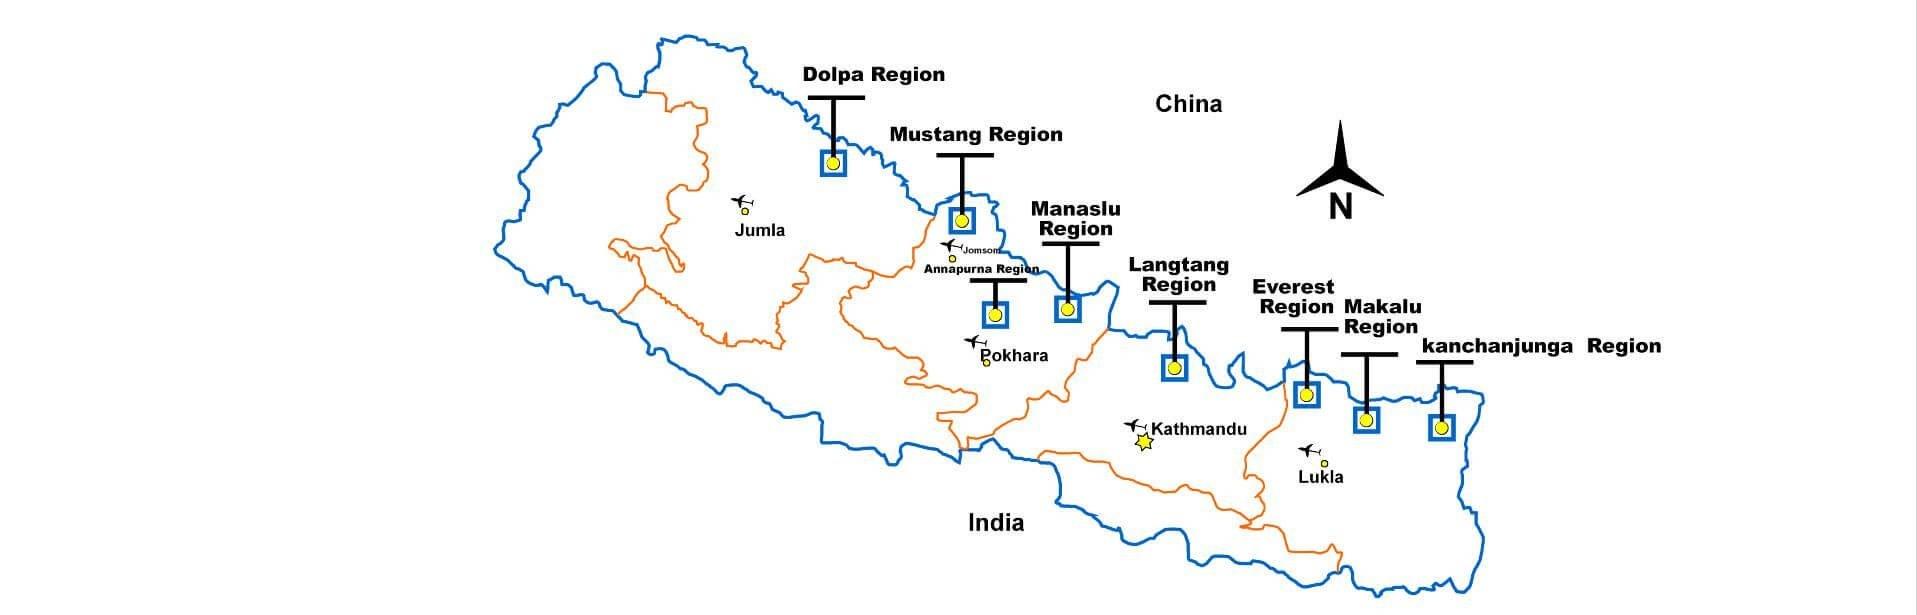 Trekking-Regions-of-Nepal